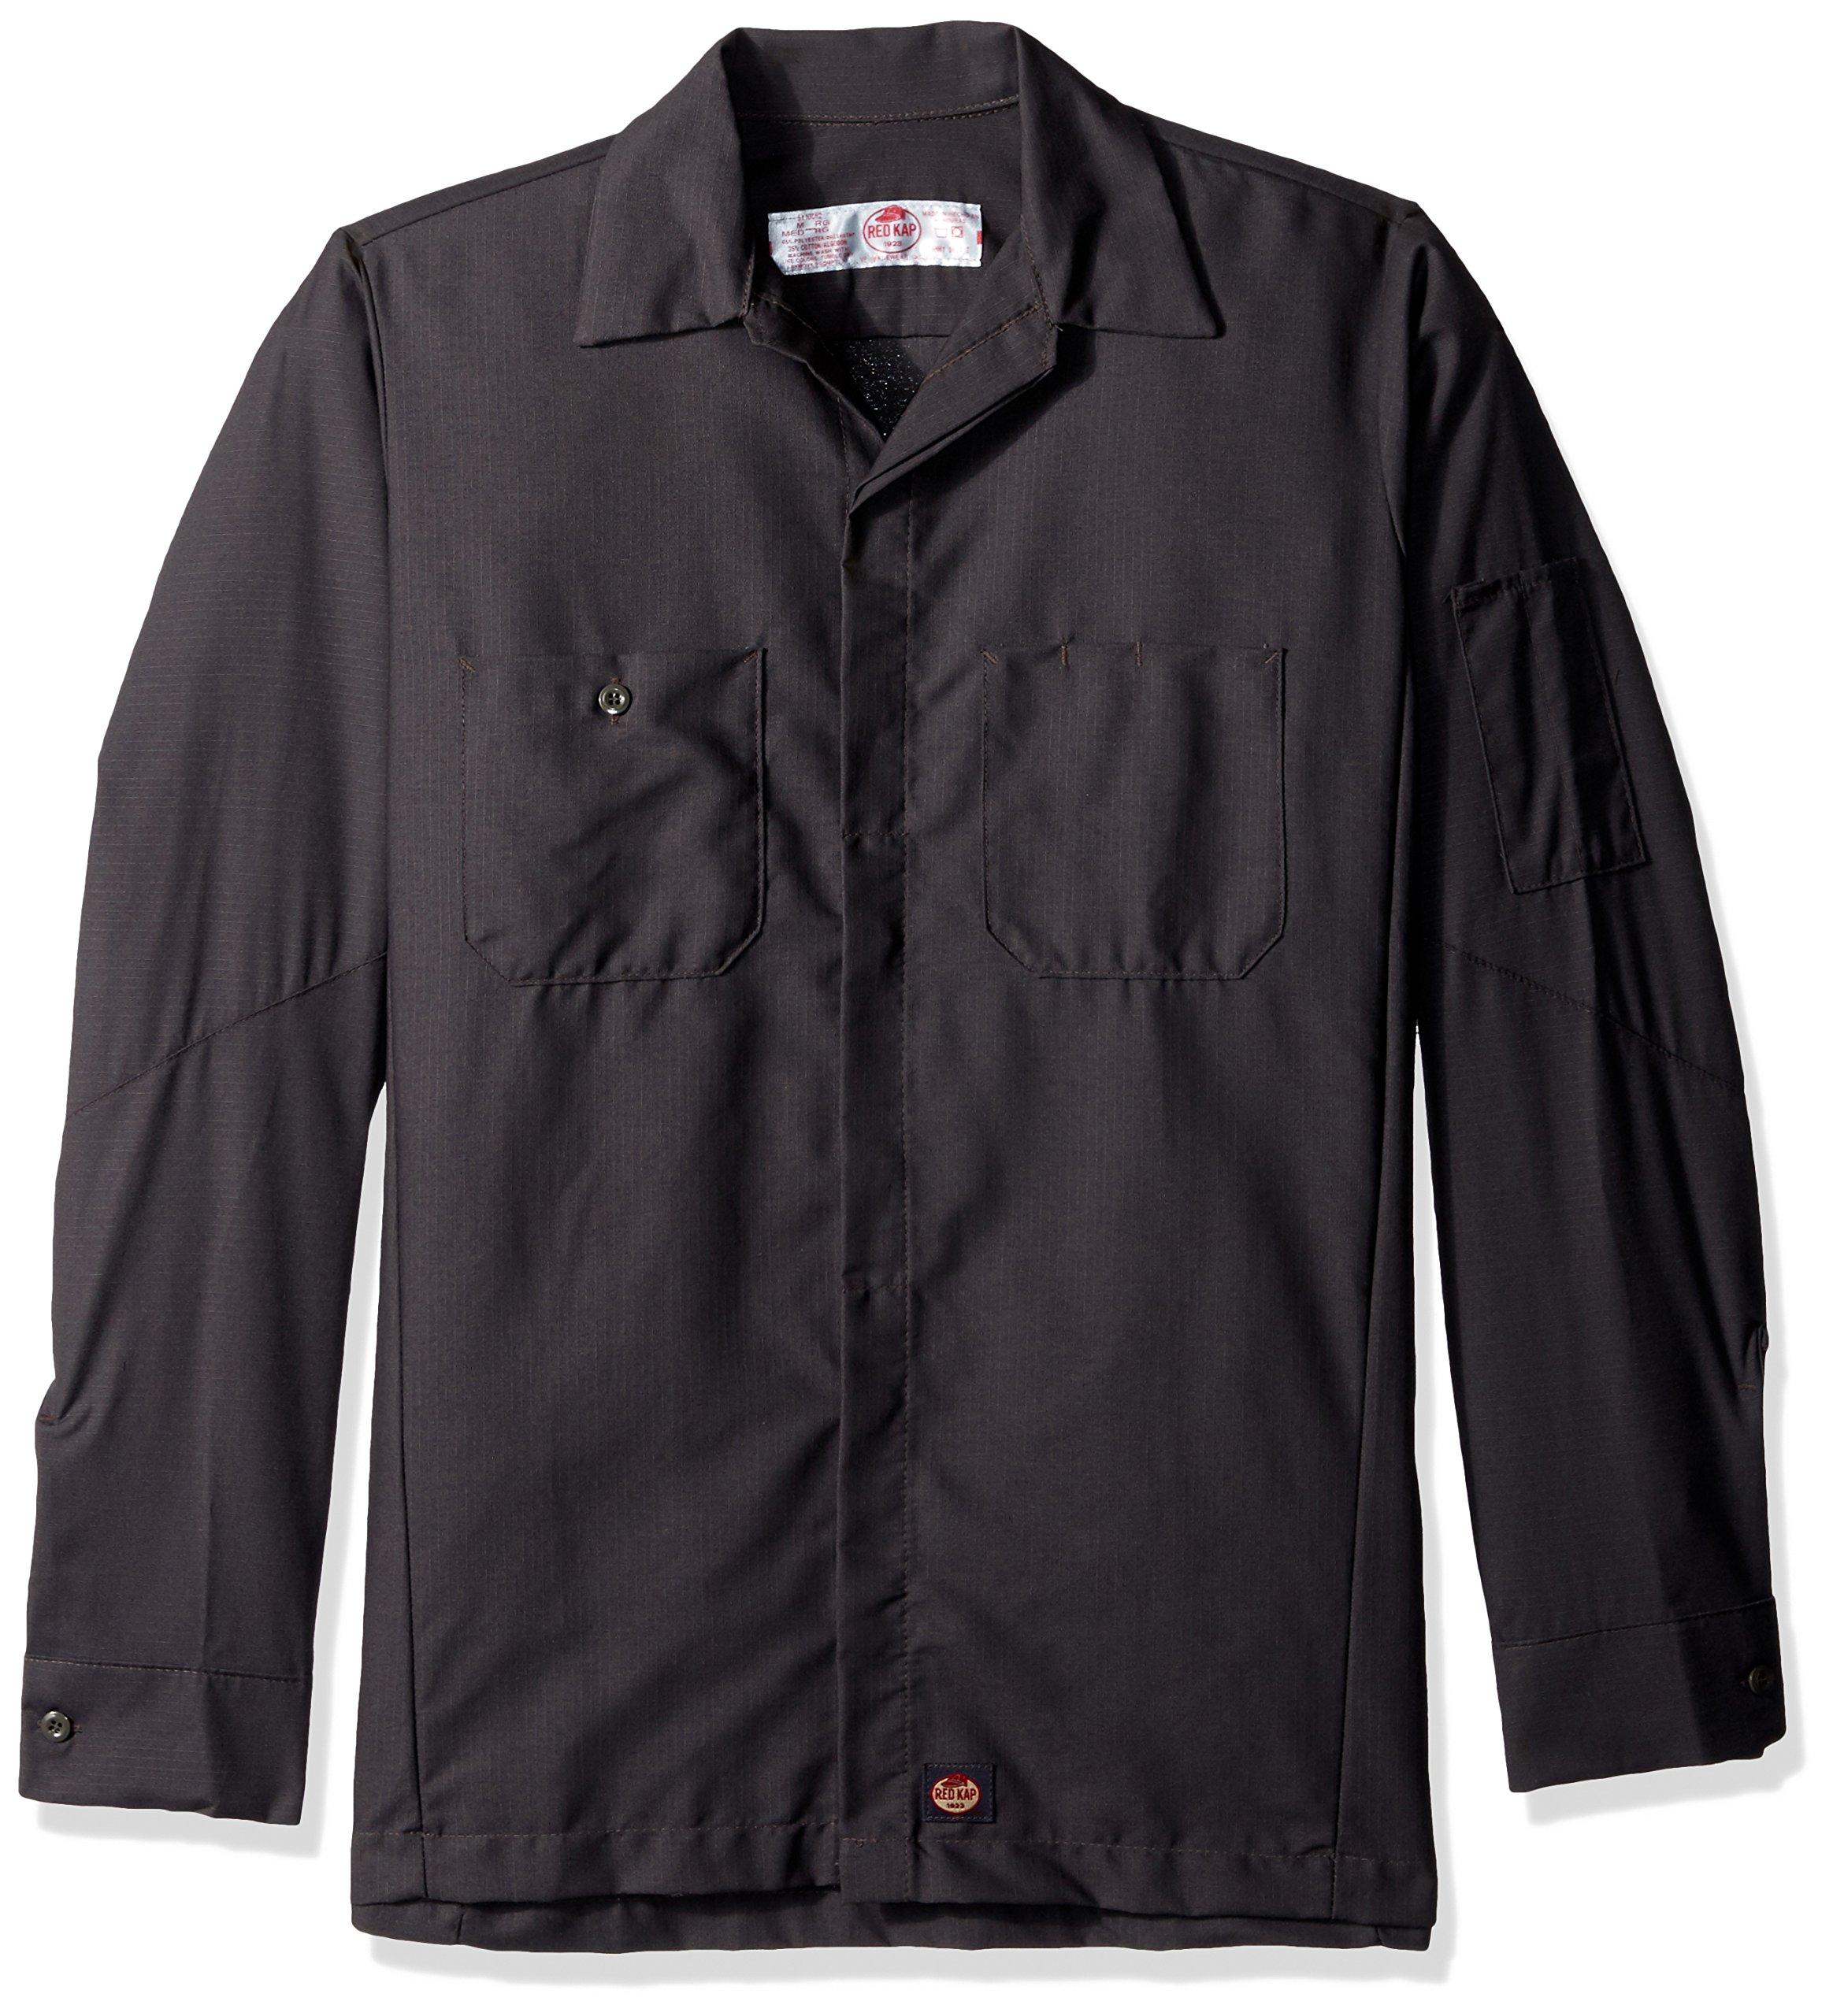 Red Kap Men's Ripstop Crew Shirt, Long Sleeve, Charcoal, Small